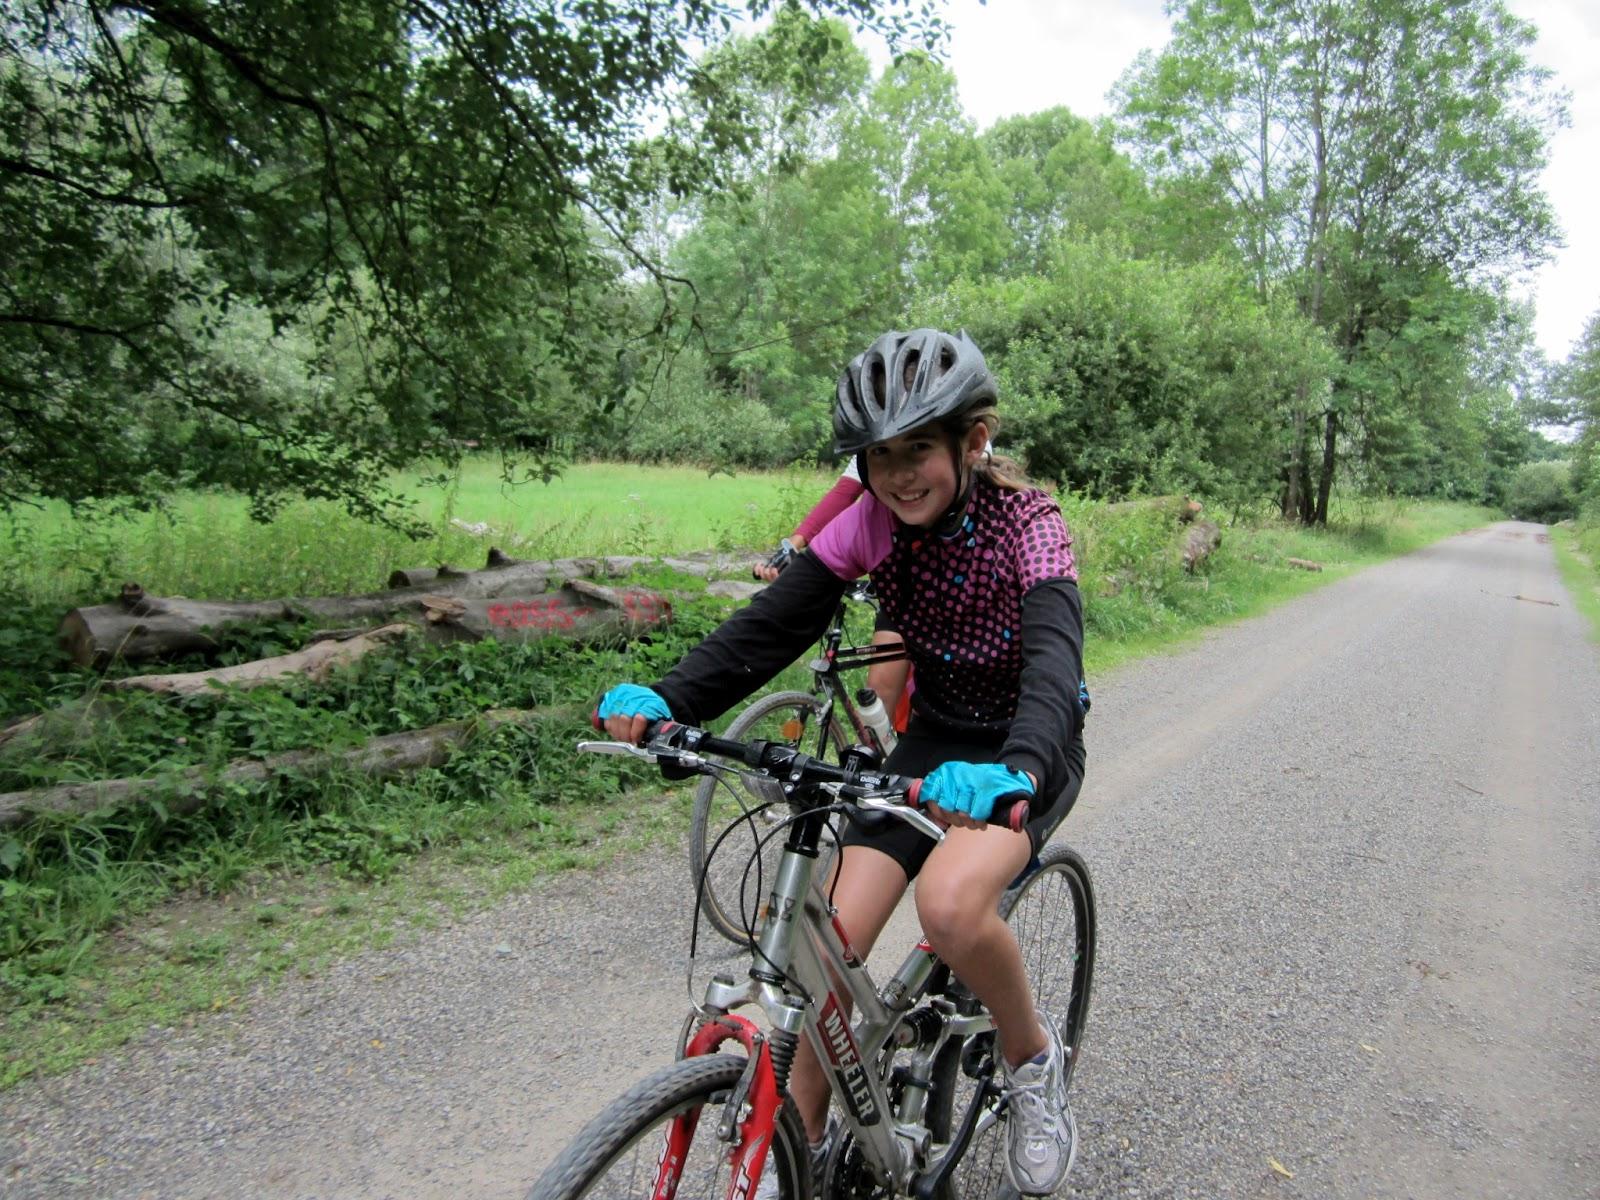 Roland Sturm: Family Bike Rides in Germany.